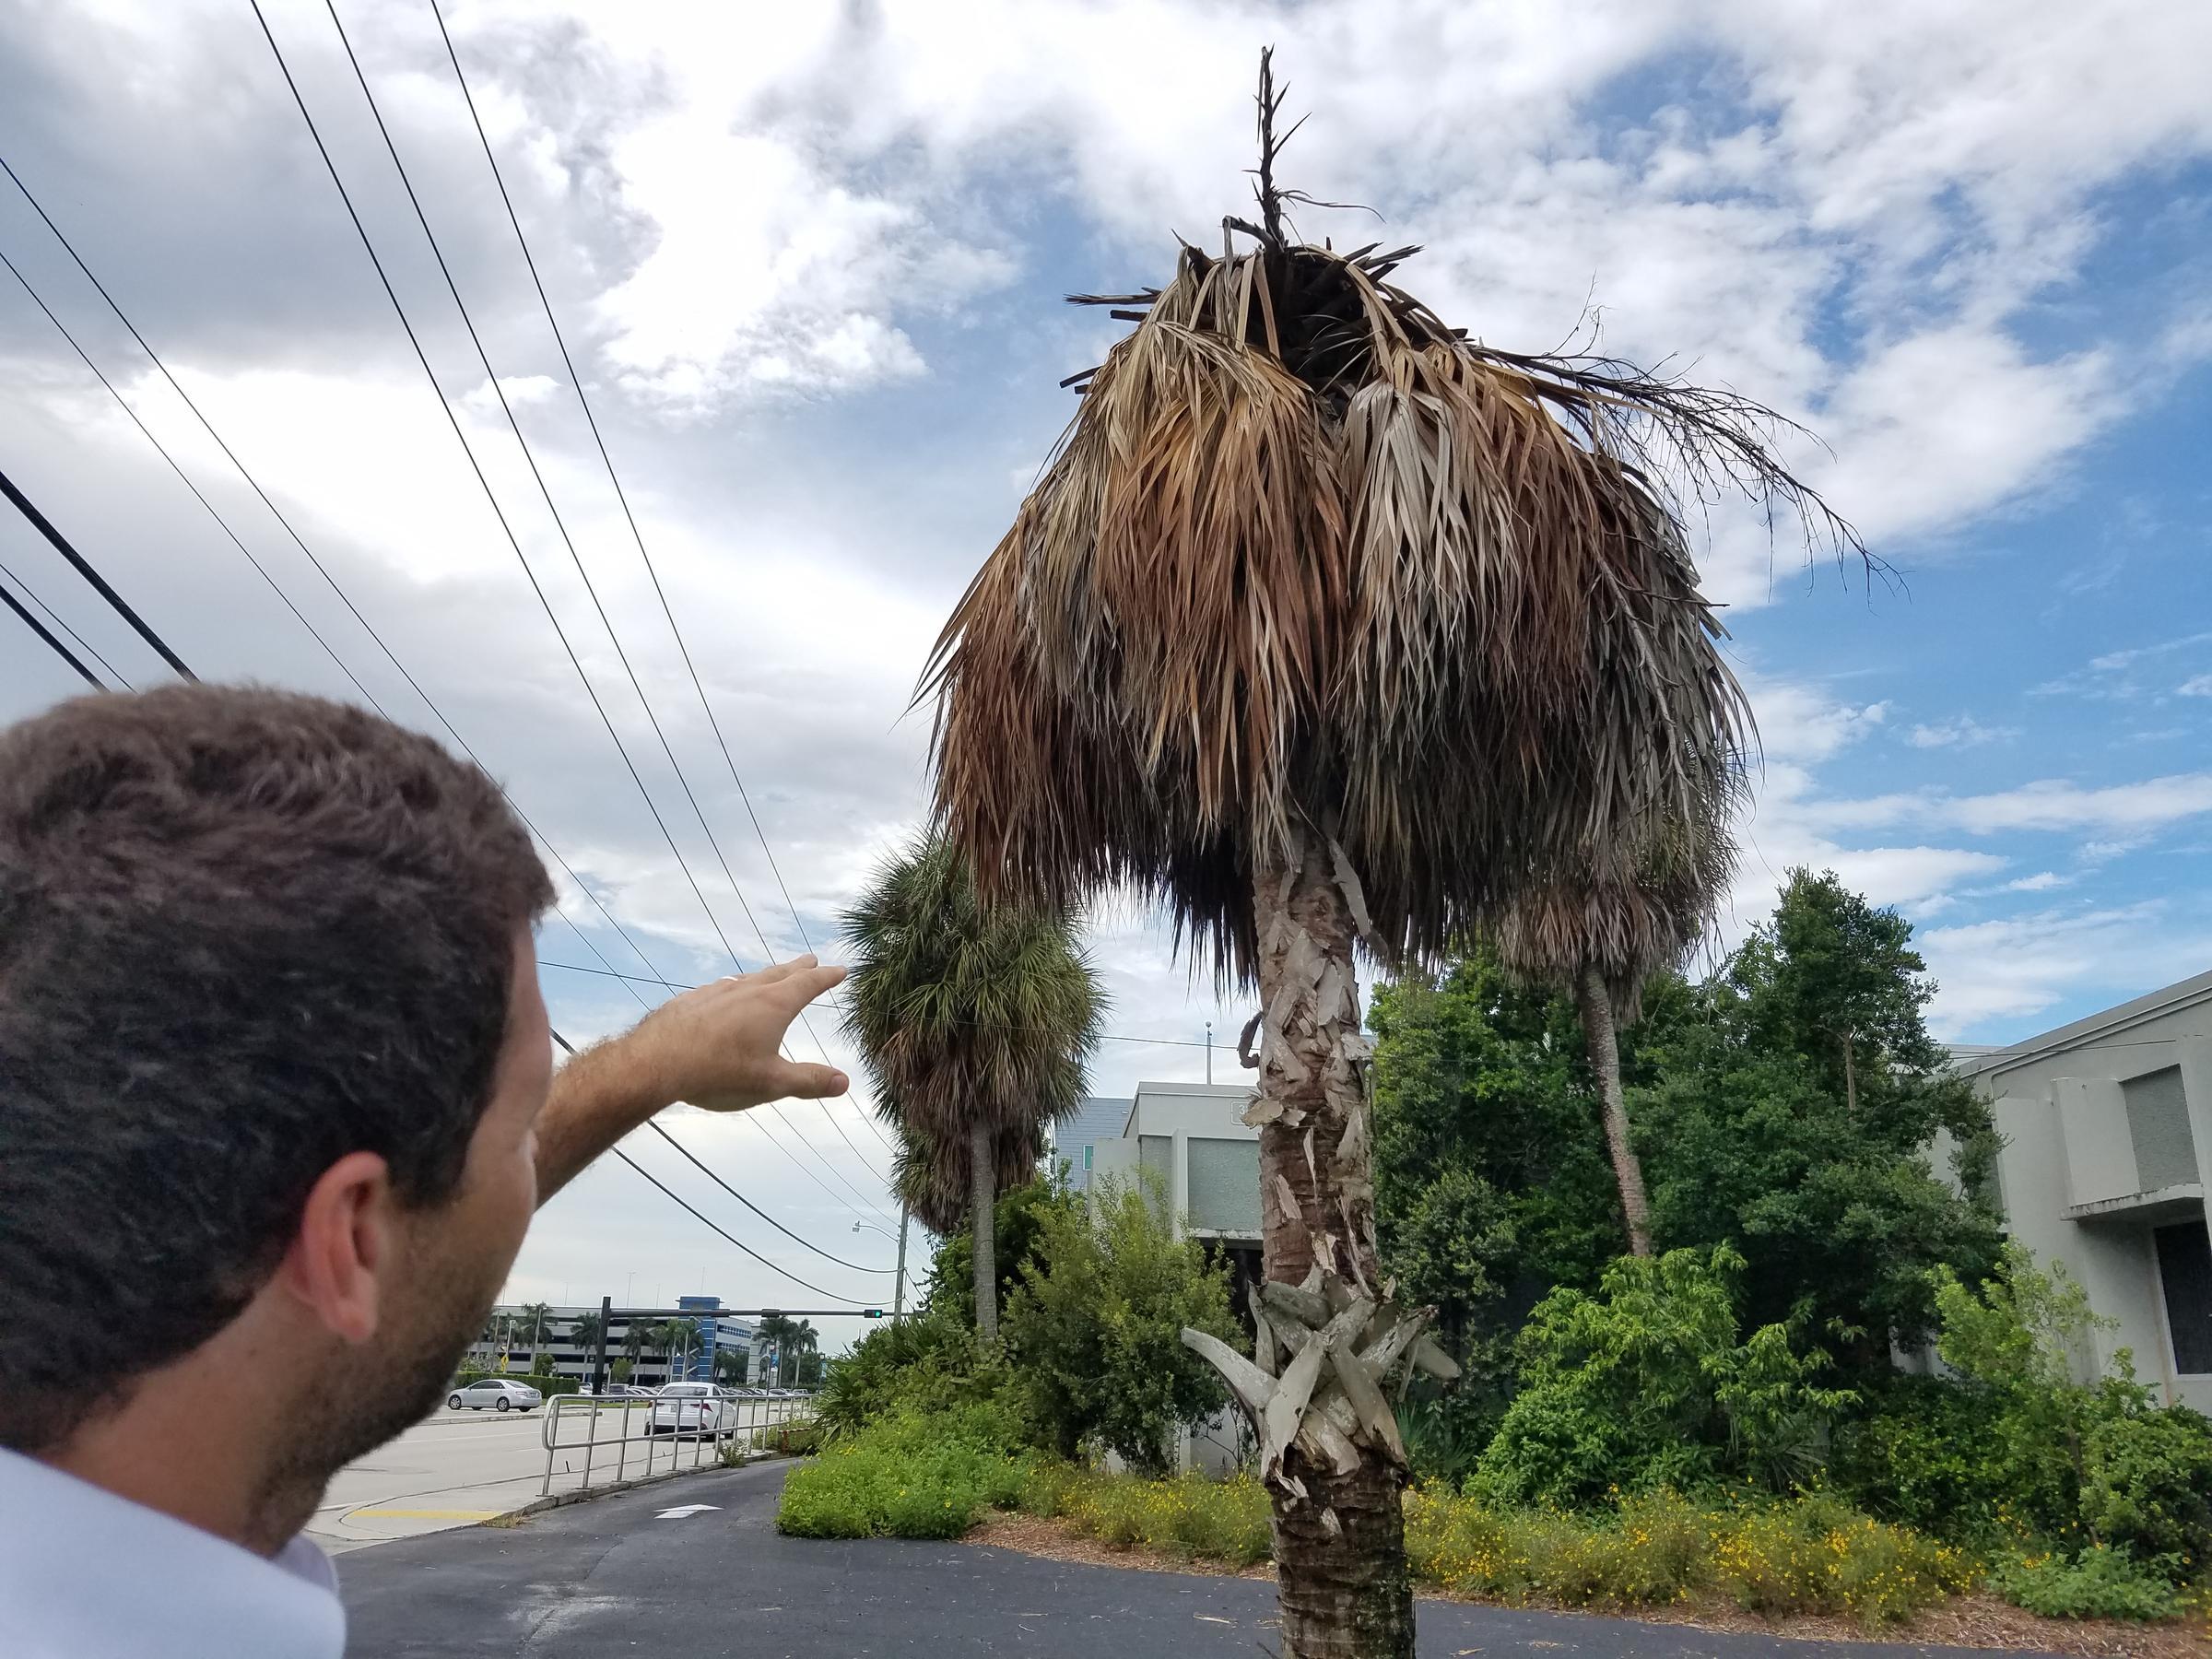 Invasive Bacteria Threatens Florida's Palm Trees